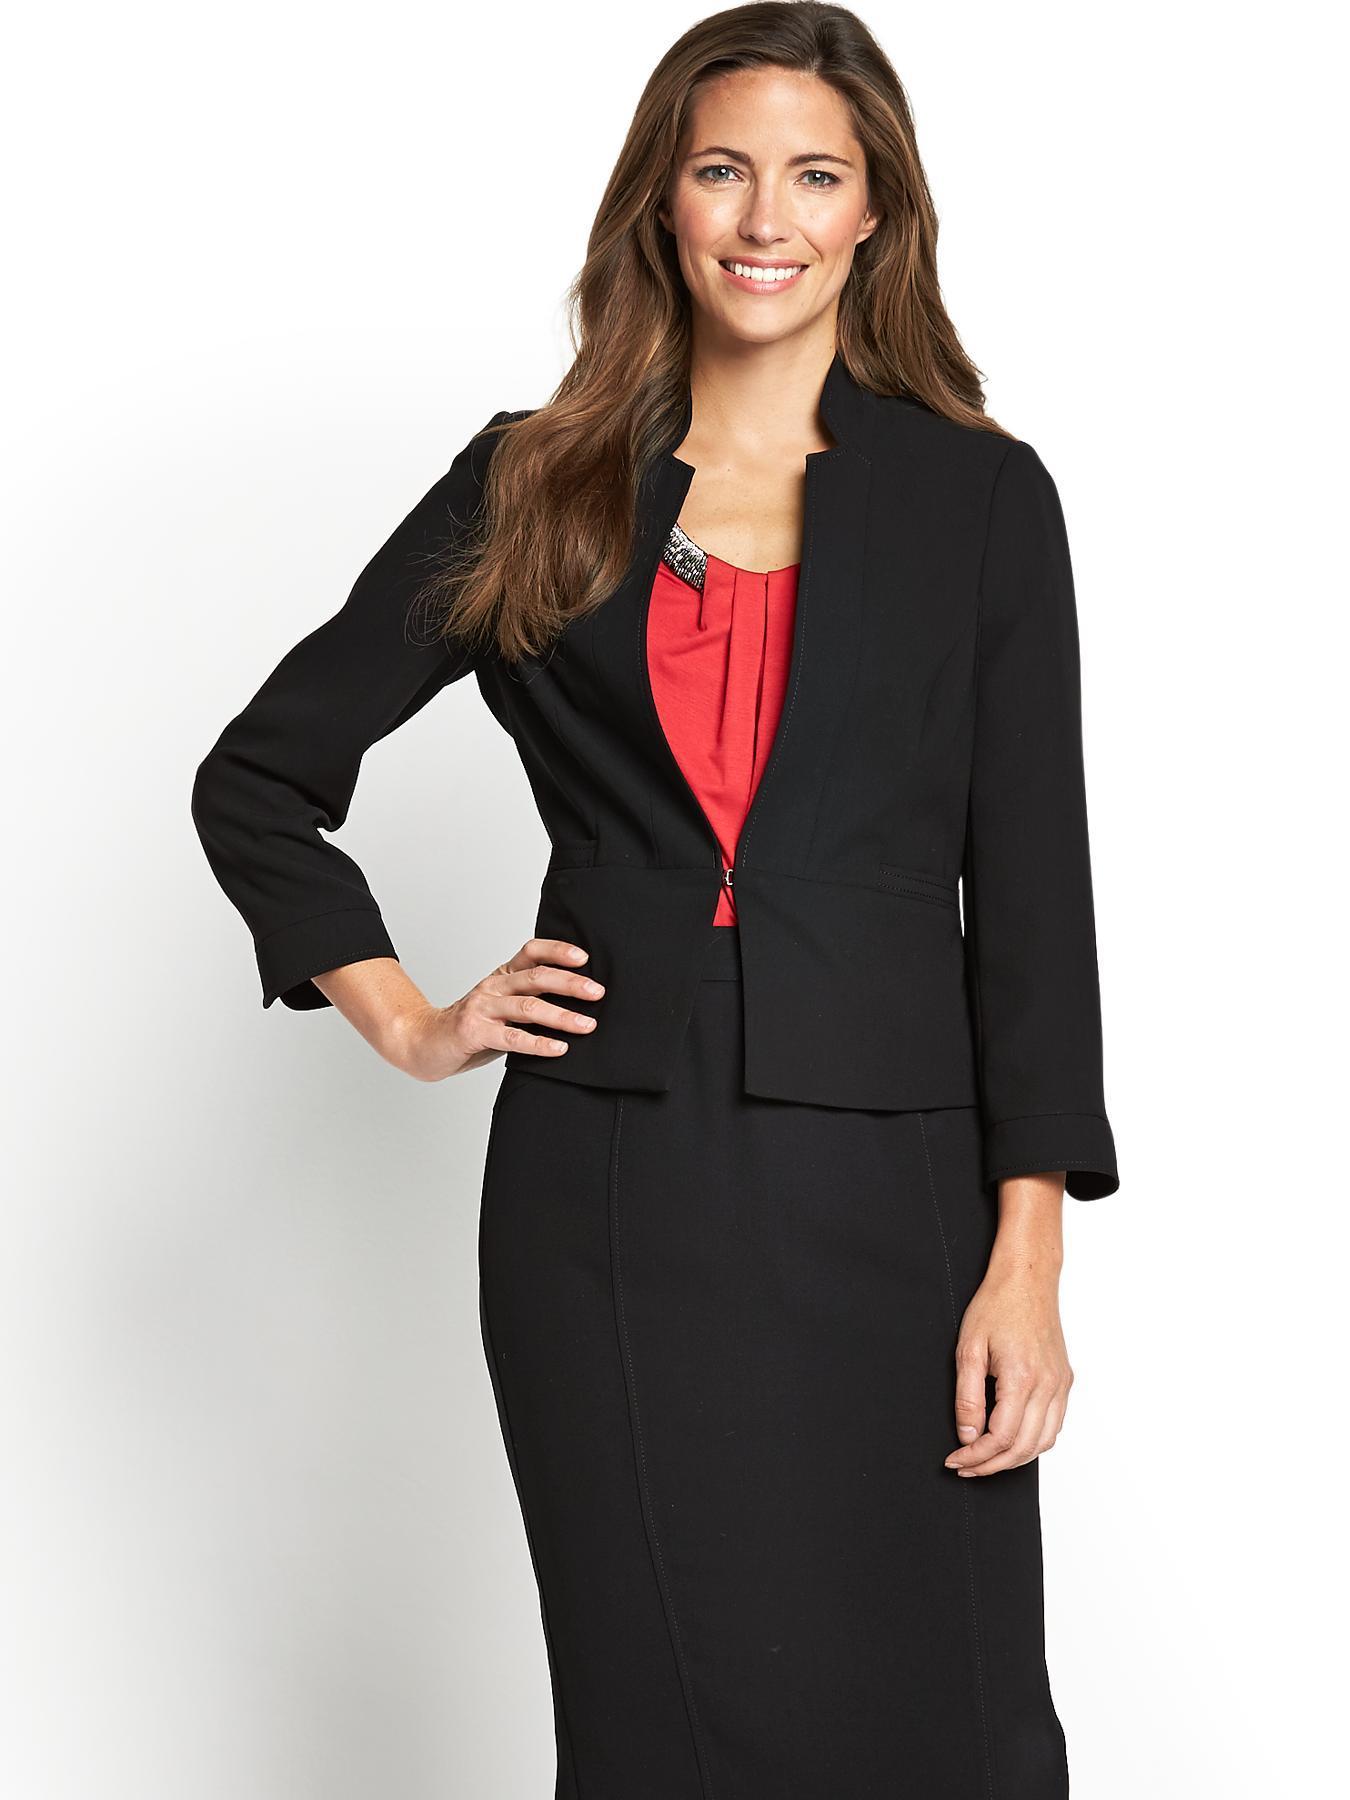 Short Rochette Jacket, Black